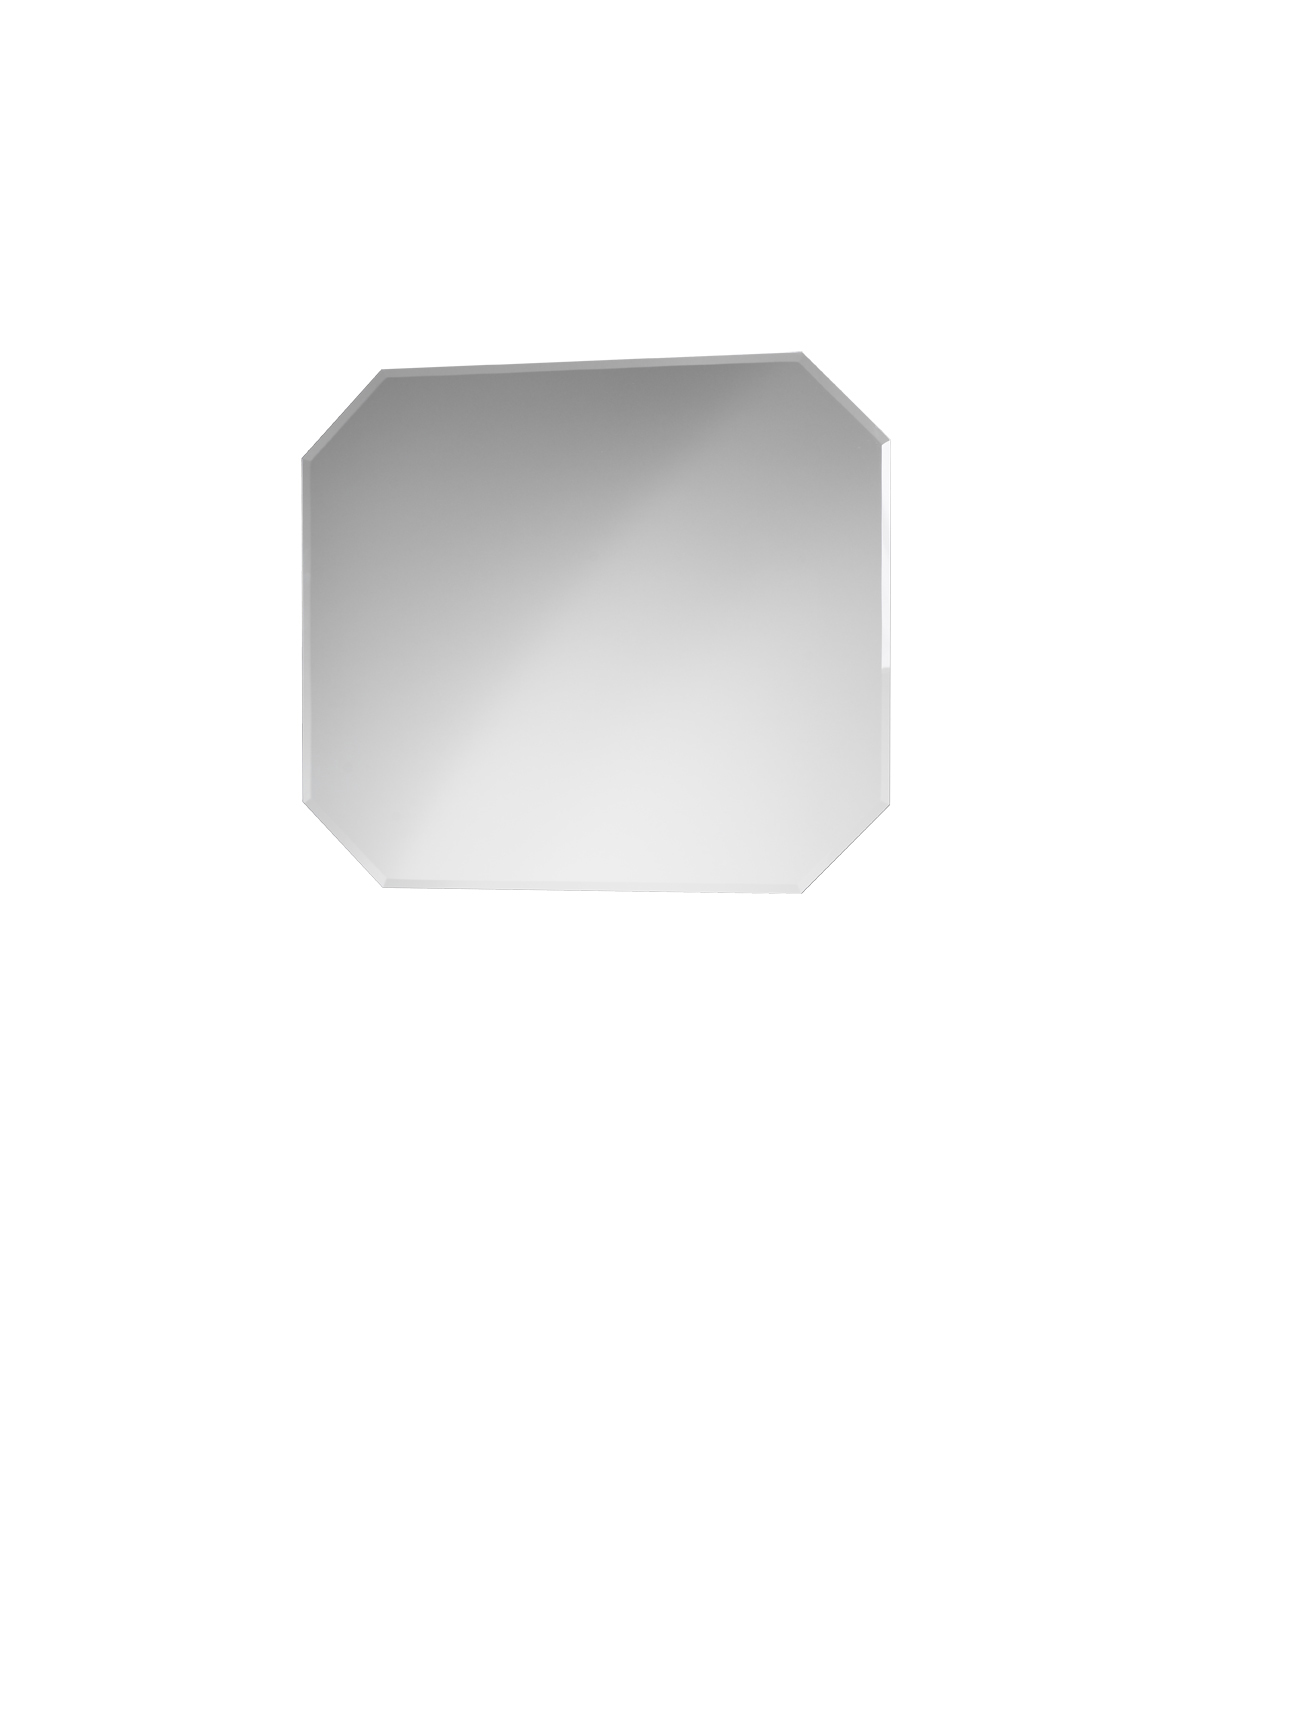 Jokey Facettenspiegel / Kristallspiegel Nelso rechteckig 60x70cm Bild 1